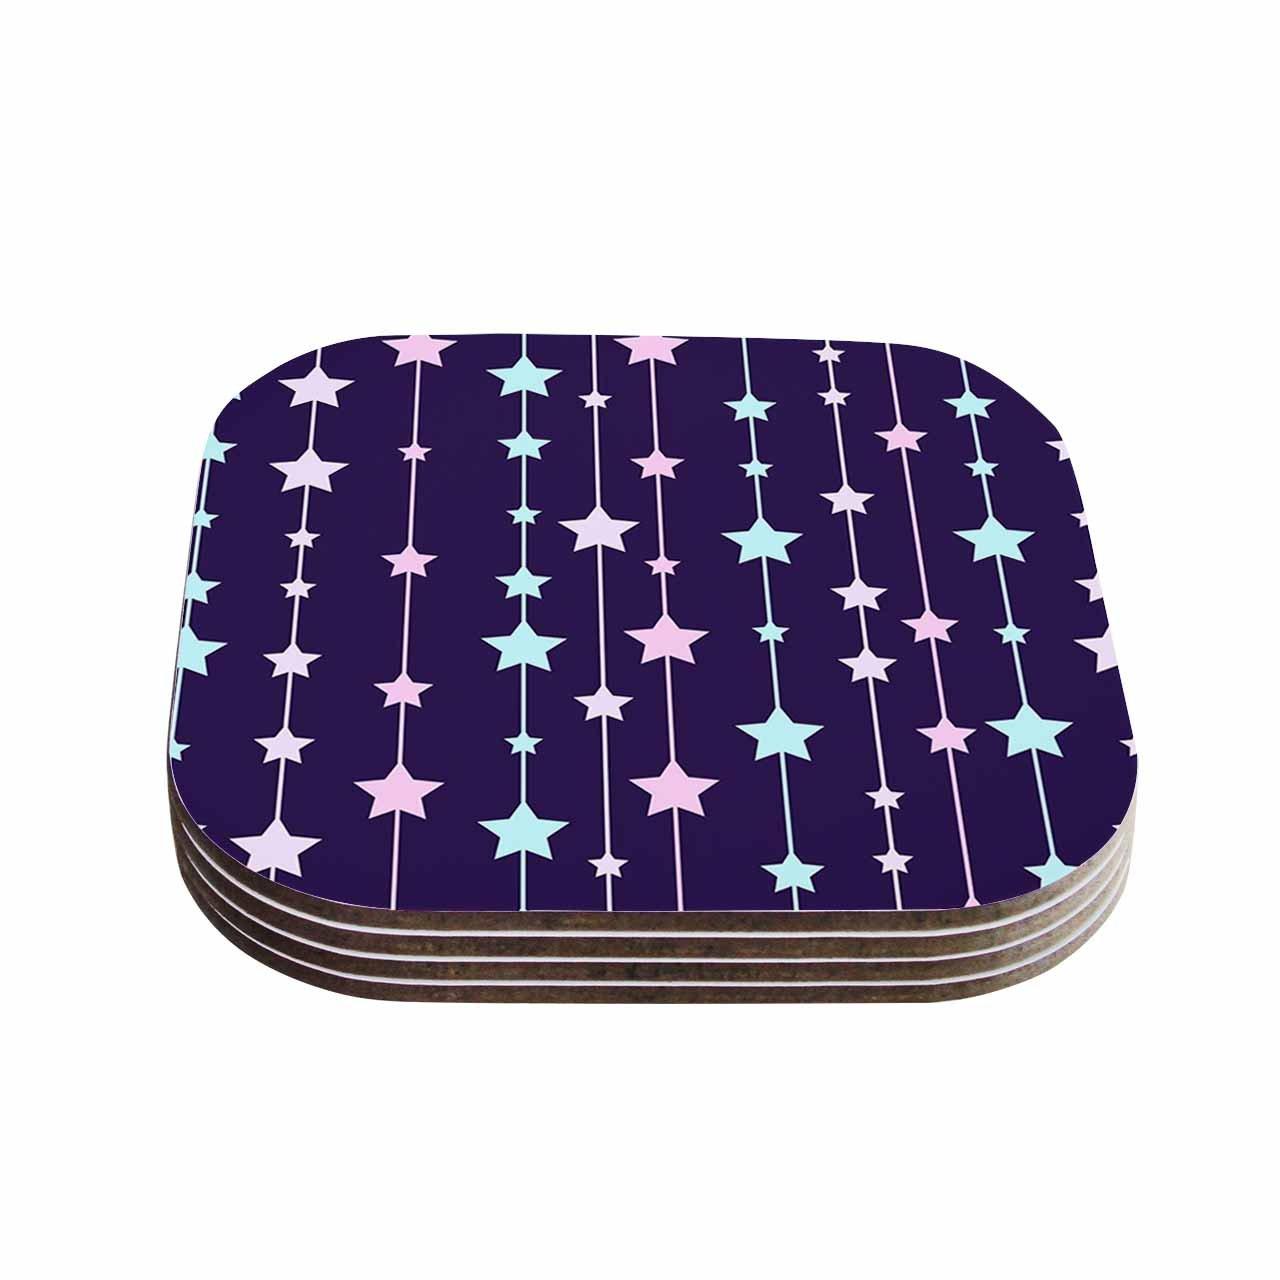 KESS InHouse NL Designs'Twinkle Twinkle LIttle Star Purple Pastel' Coasters (Set of 4), 4 x 4', Multicolor